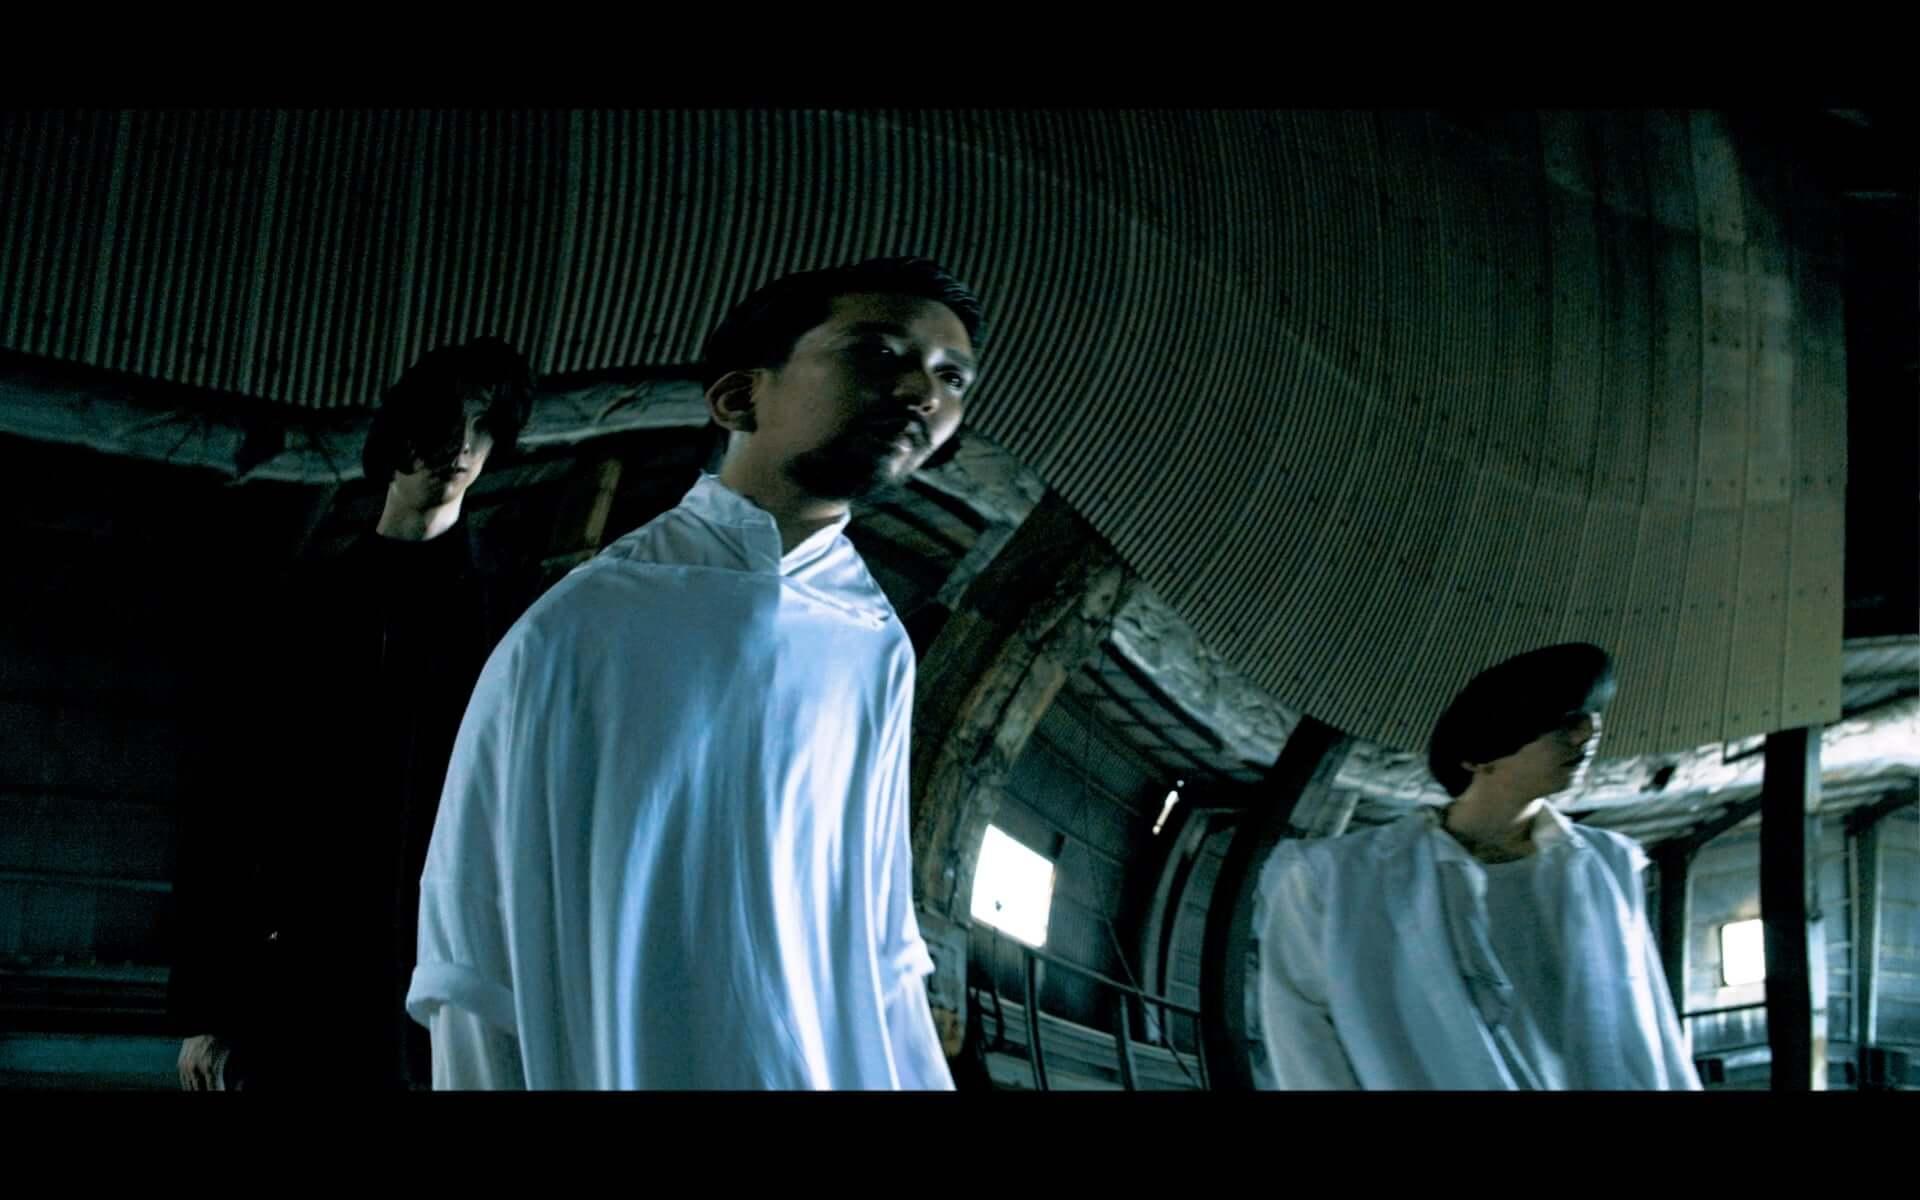 "gatoの最新シングル""dada""が配信開始&MVも公開!バンド初のフルアルバム『BAECUL』もリリース決定 music200903_gato_4-1920x1200"